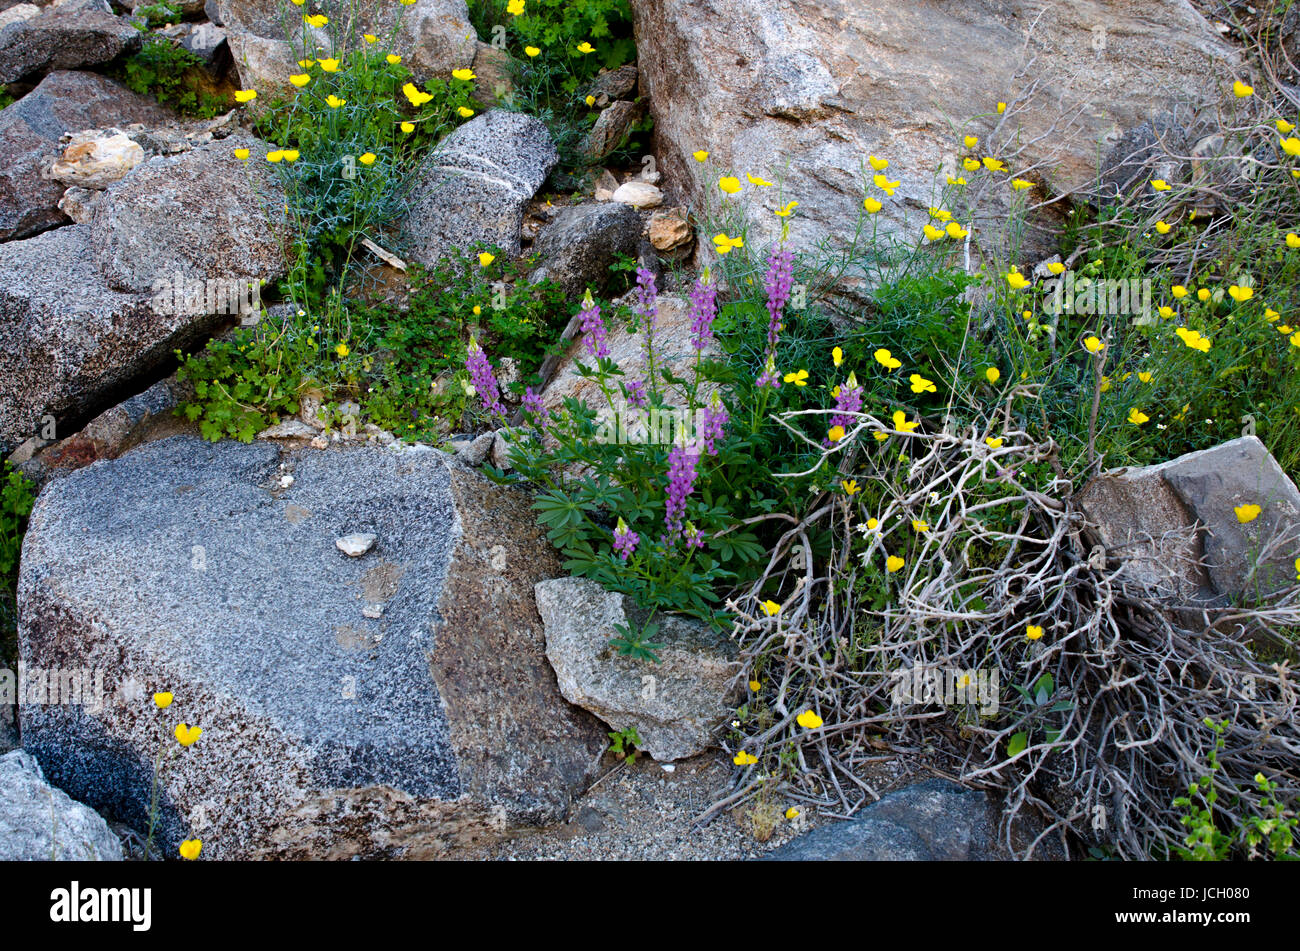 Anza-Borrego State Park Superbloom Spring 2017 - Stock Image